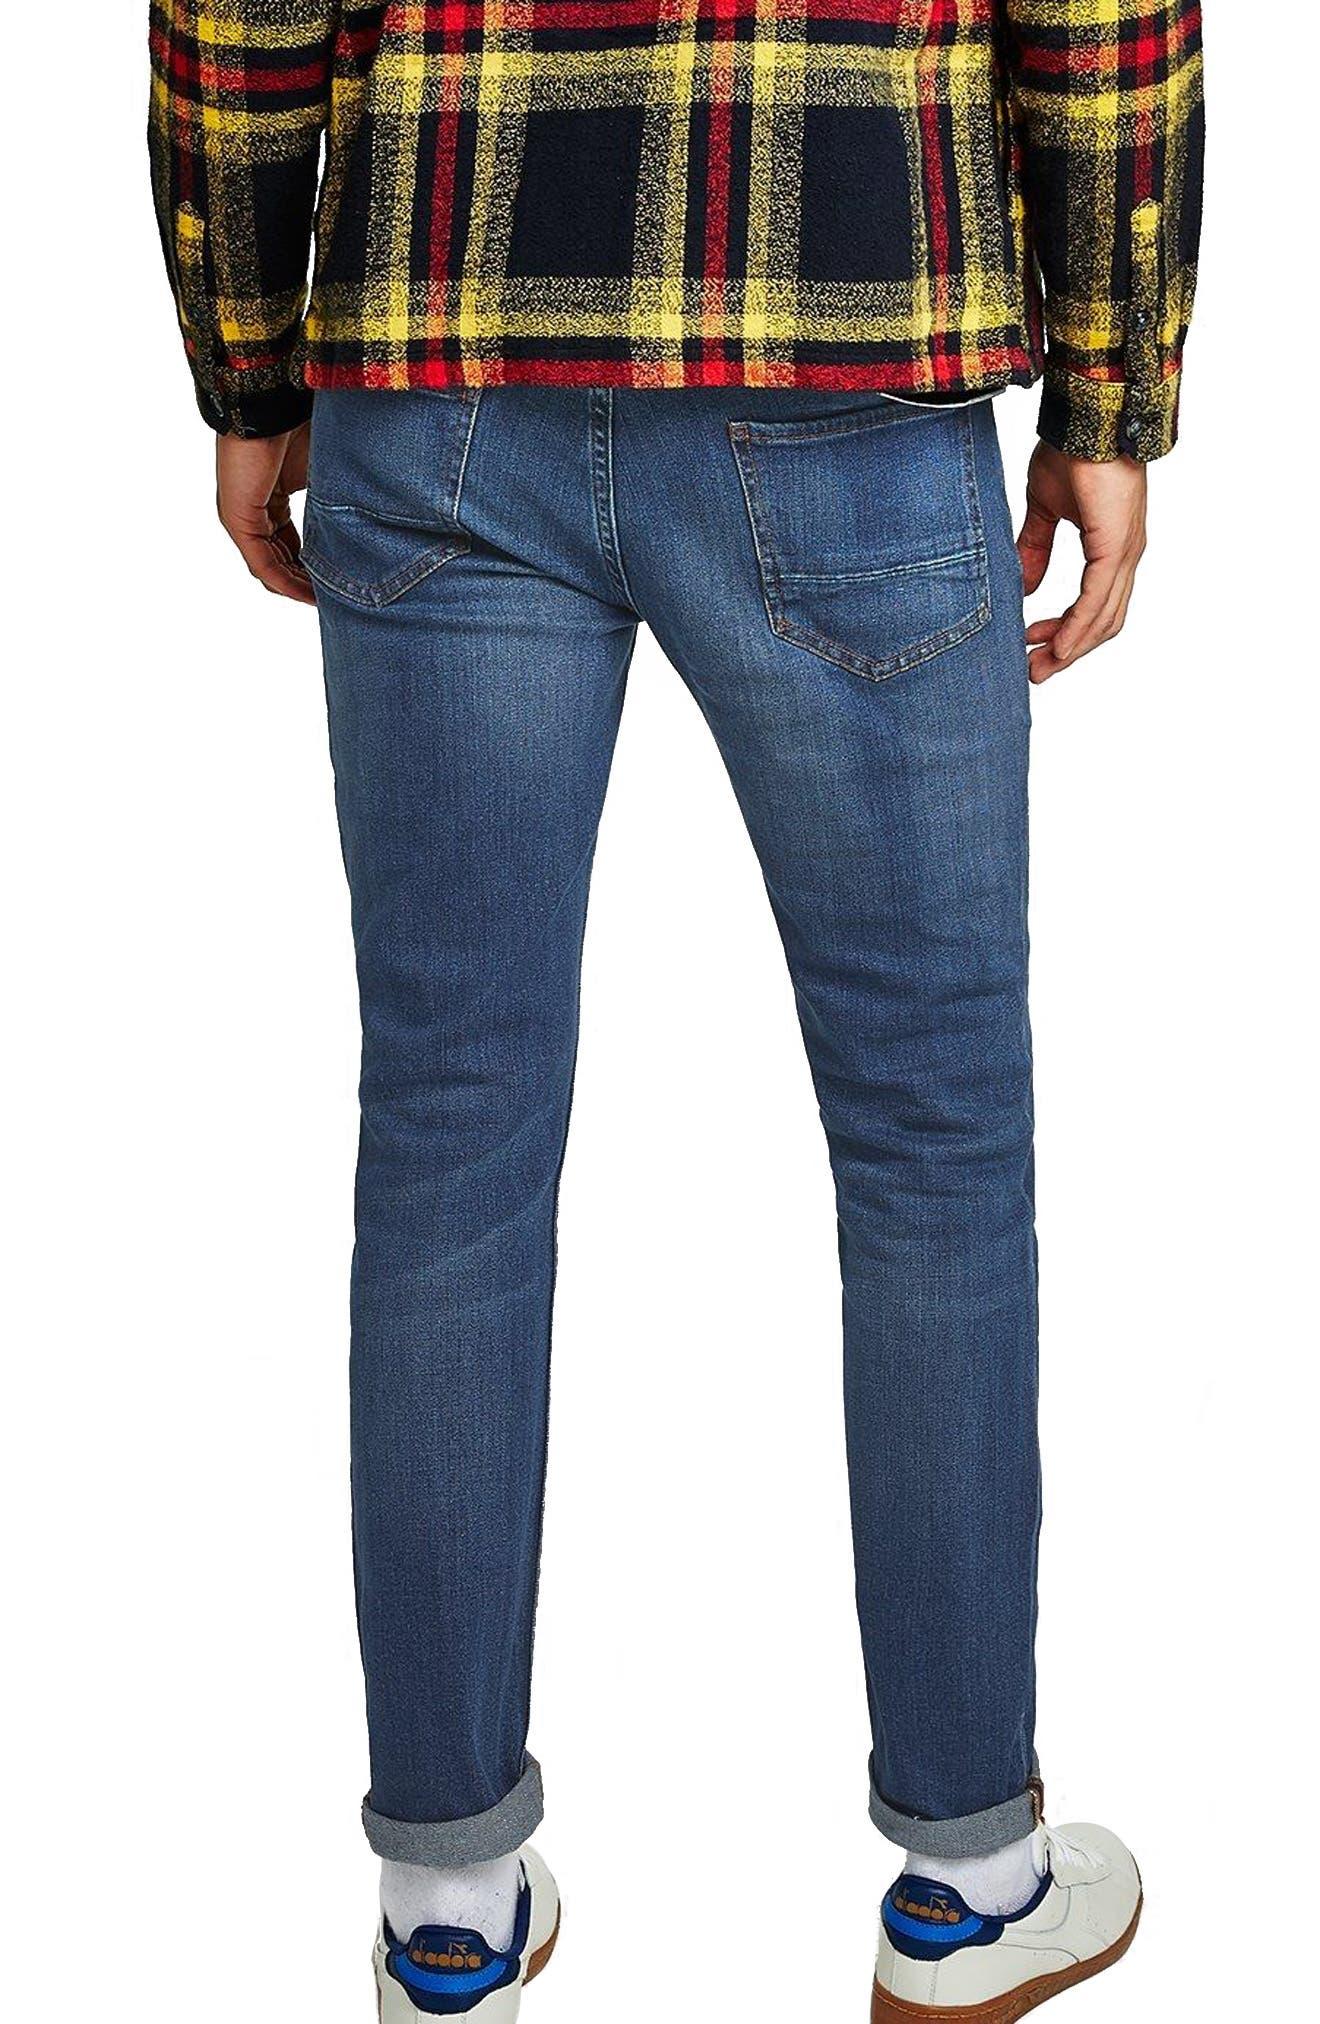 TOPMAN, Stretch Skinny Fit Jeans, Alternate thumbnail 2, color, BLUE